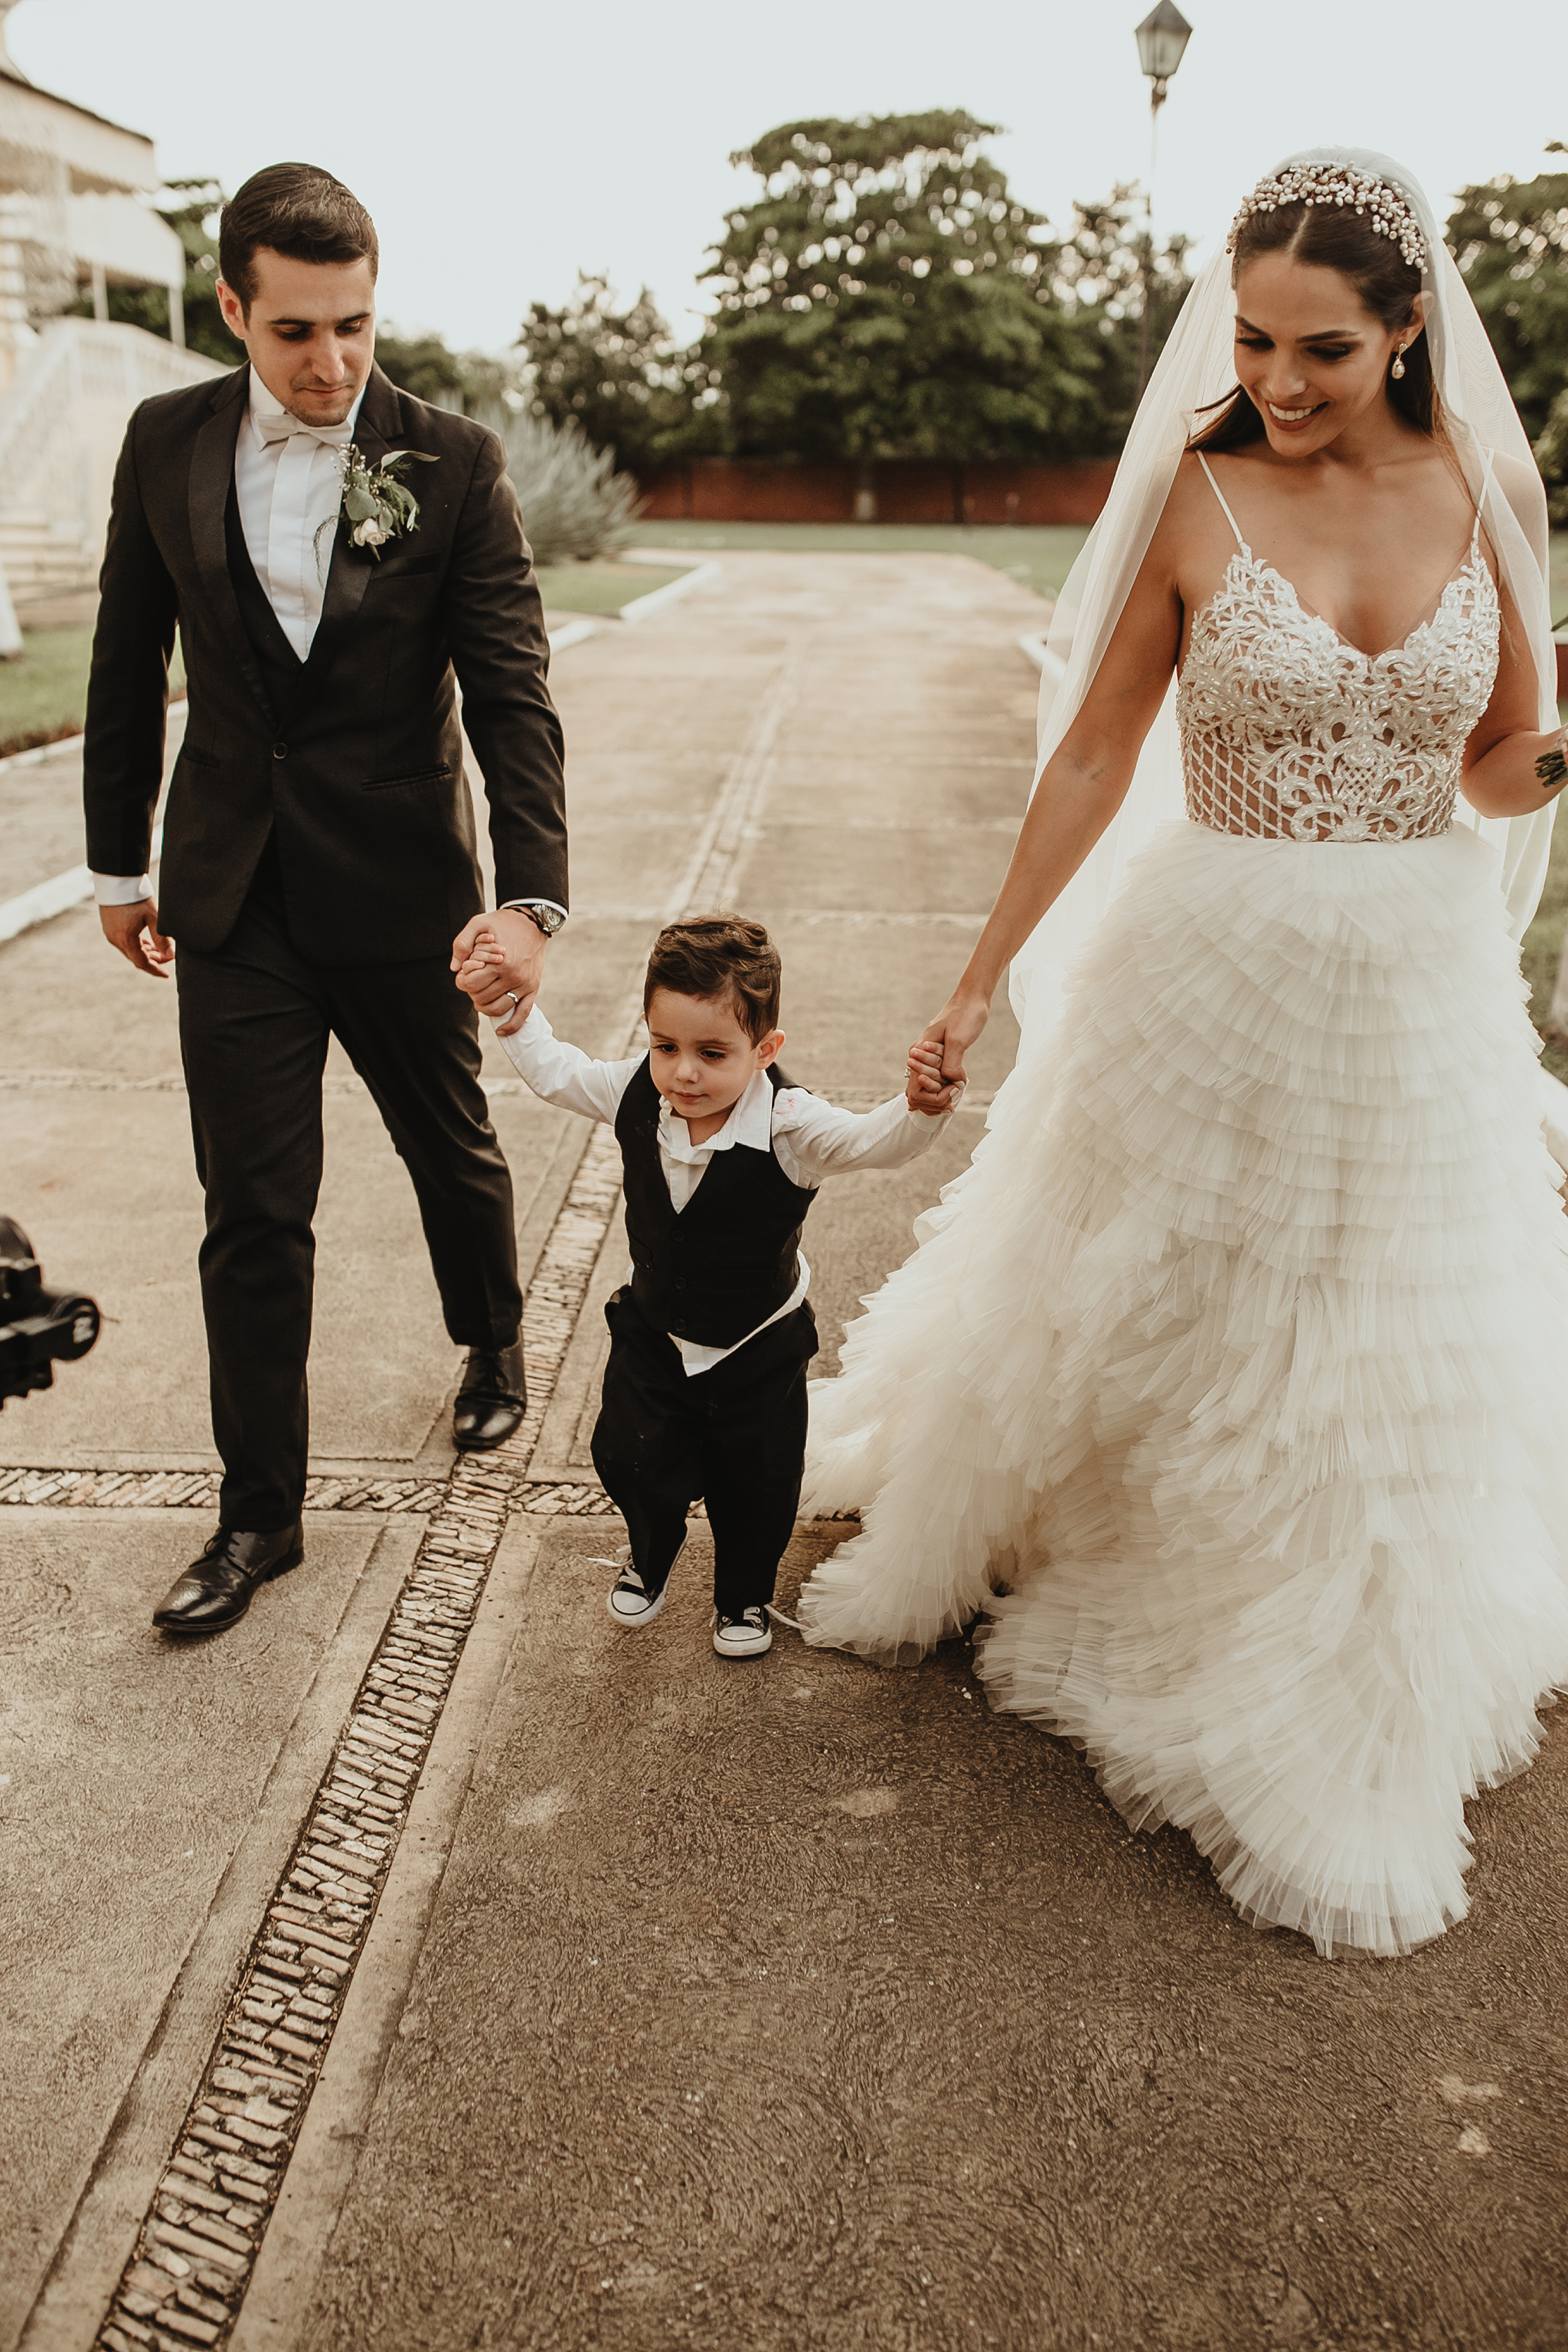 0857R&F__WeddingDestination_Weddingmerida_BodaMexico_FotografoDeBodas_FabrizioSimoneenFotografo.jpg